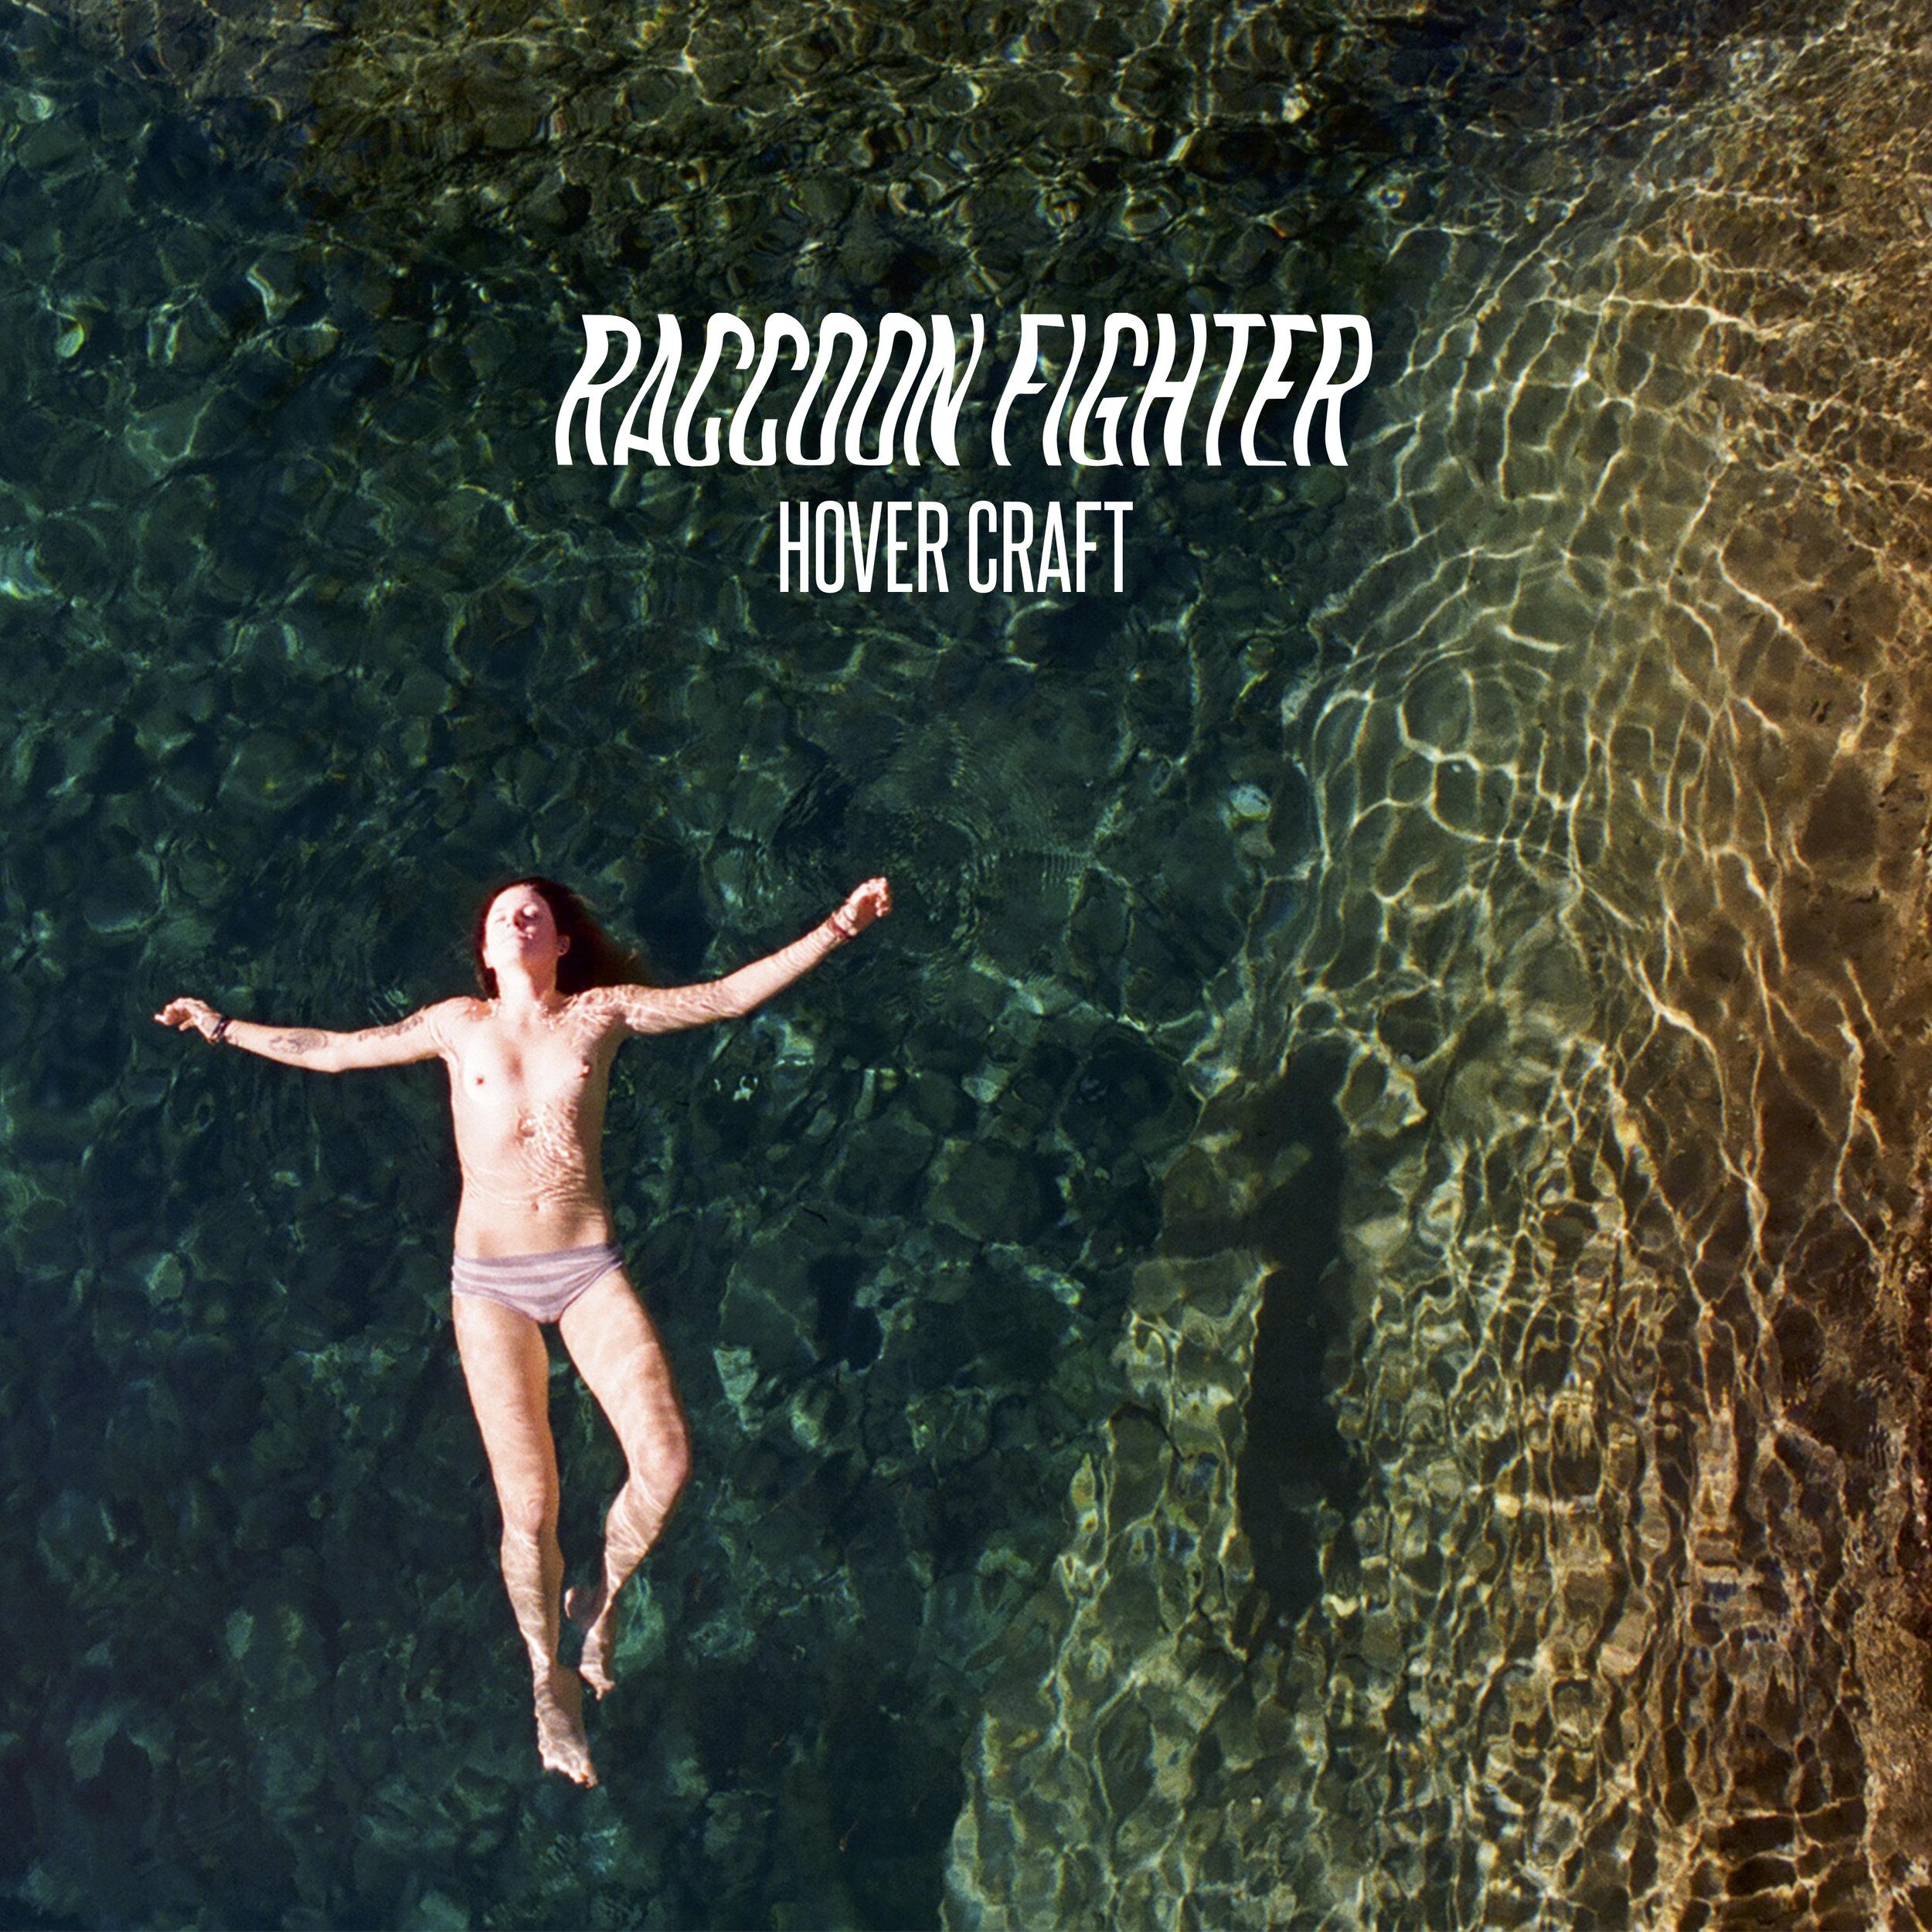 Raccoon Fighter album cover